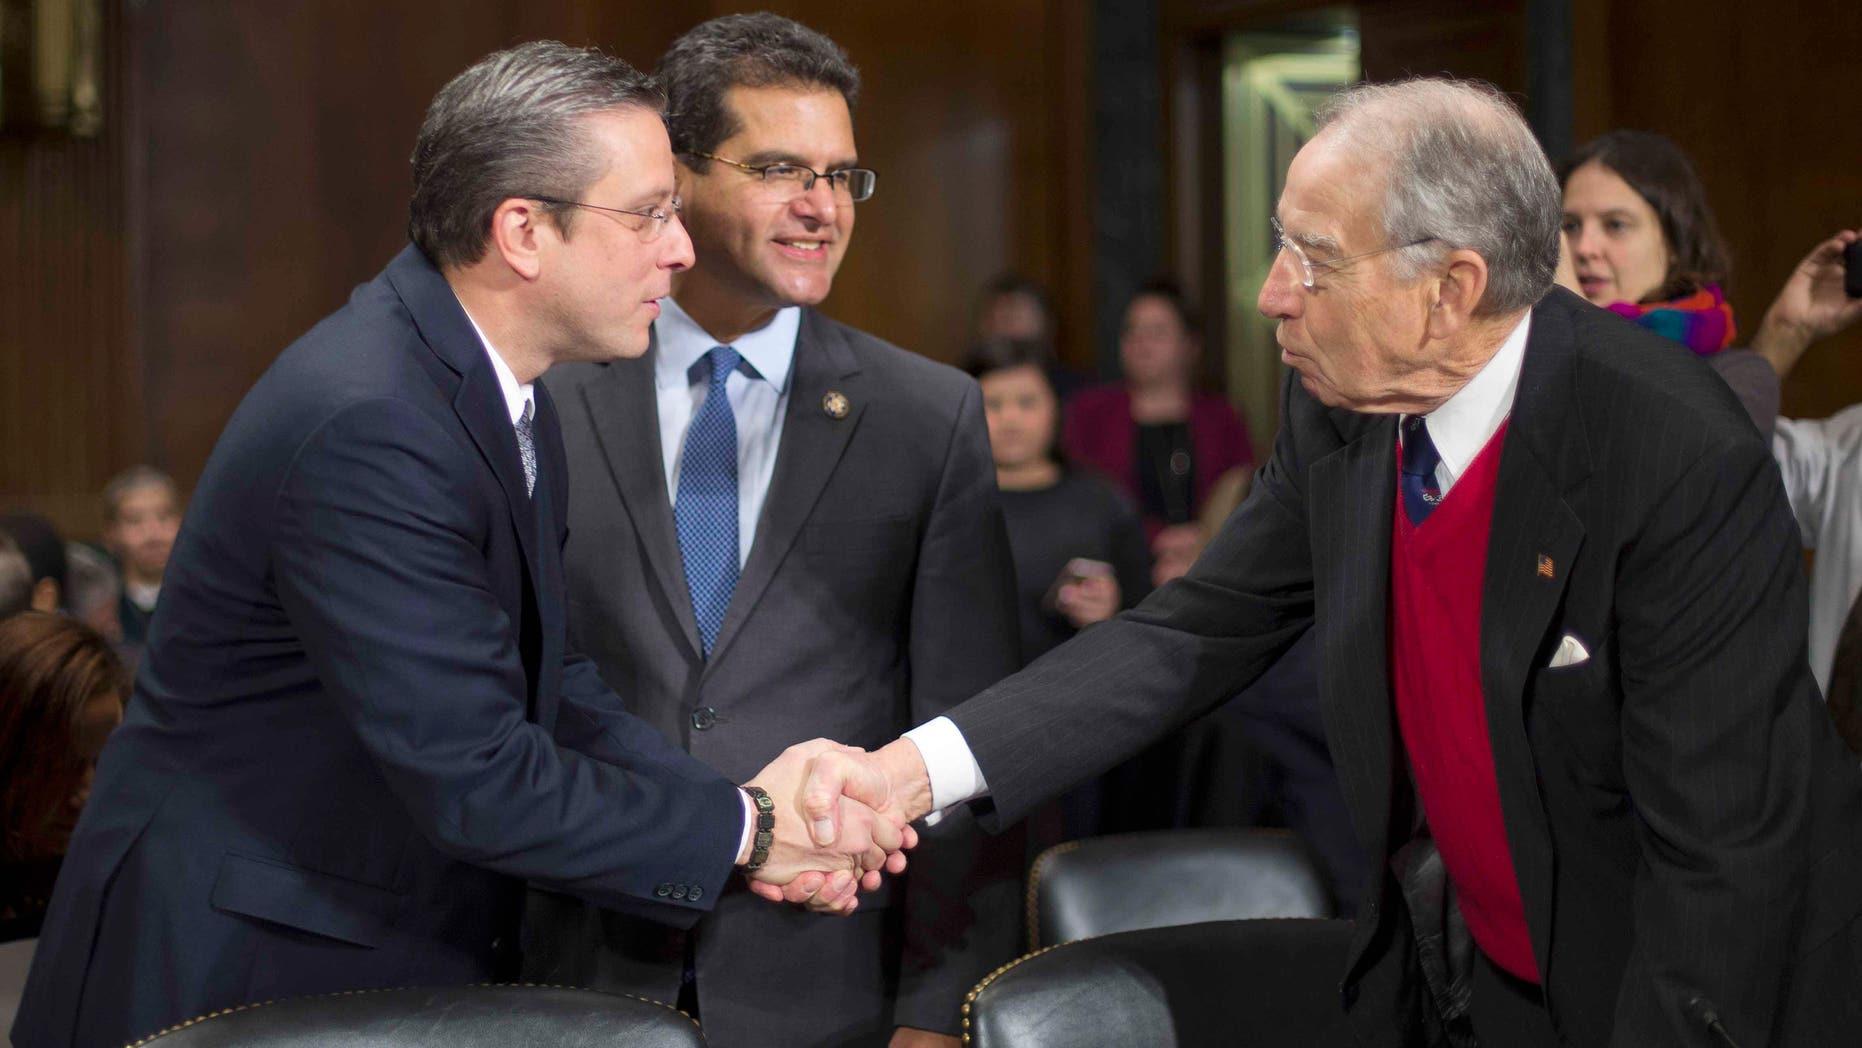 Sen. Chuck Grassley greets Puerto Rico Gov. Alejandro Garcia Padilla on Capitol Hill, Tuesday, Dec. 1, 2015.